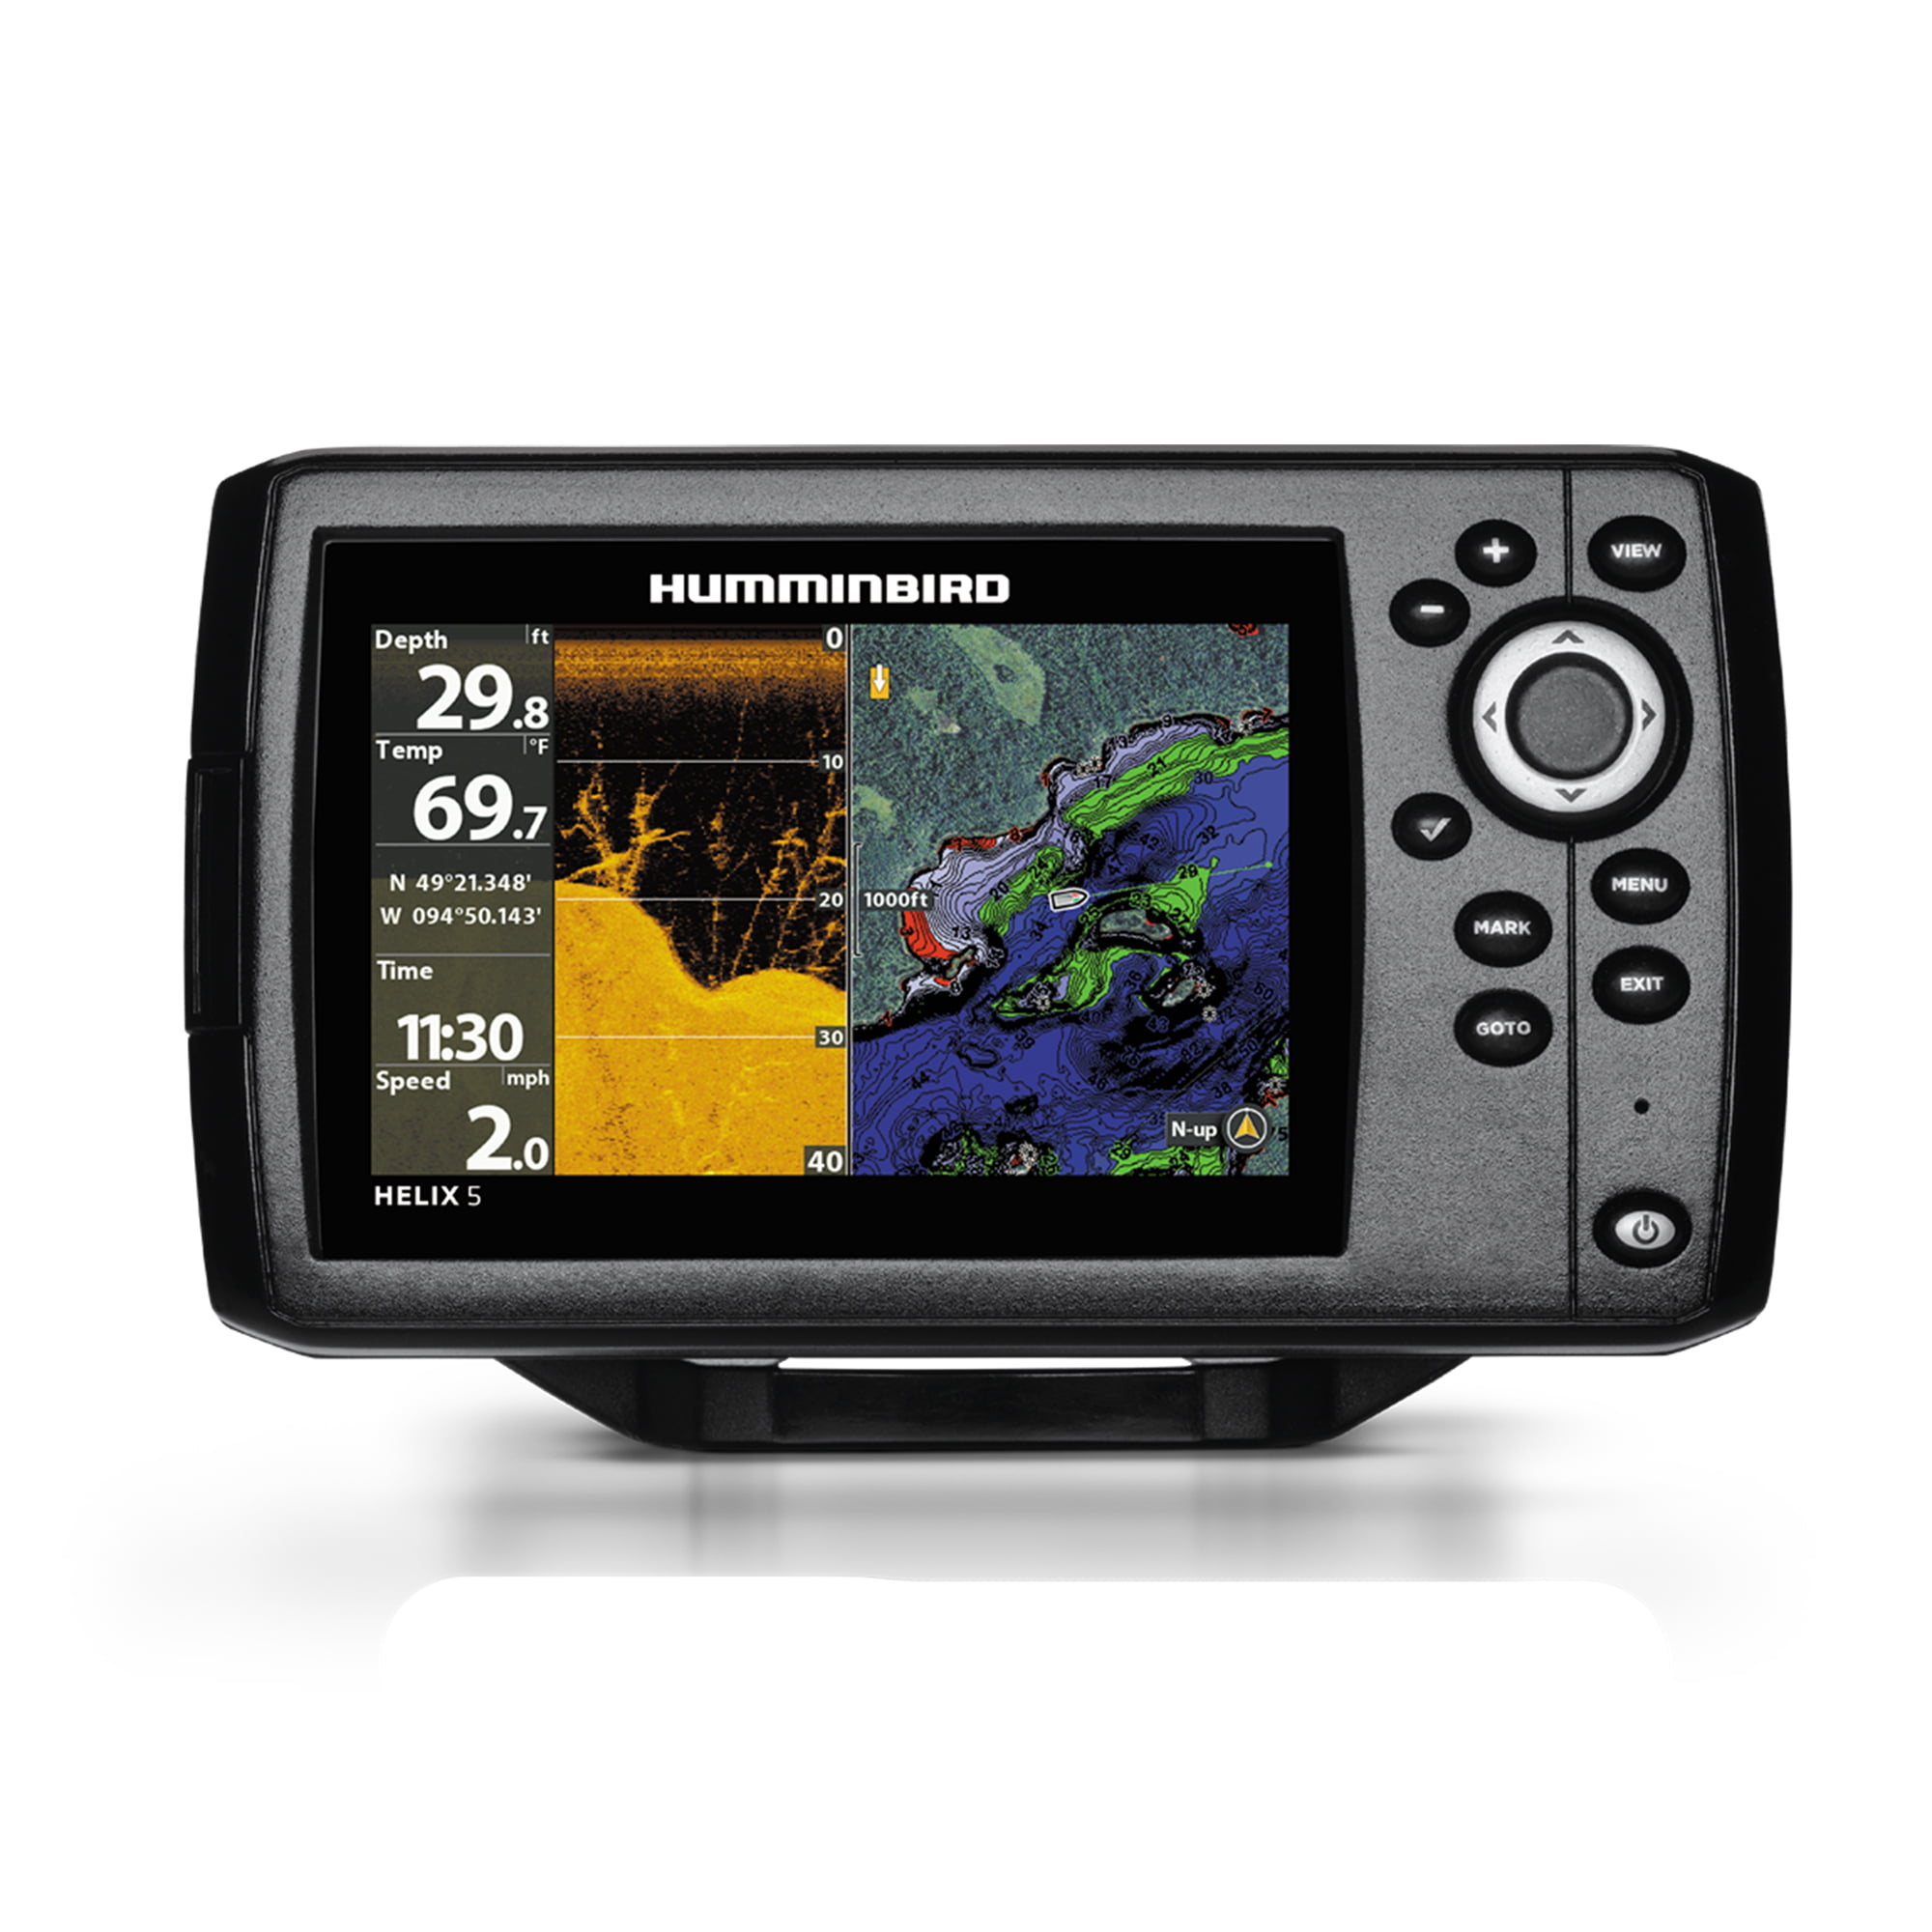 "Humminbird 410220-1NAV HELIX 5 CHIRP DI GPS G2 Sonar Fishfinder & Chartplotter with Down IMaging, Navionics & 5""... by Humminbird"